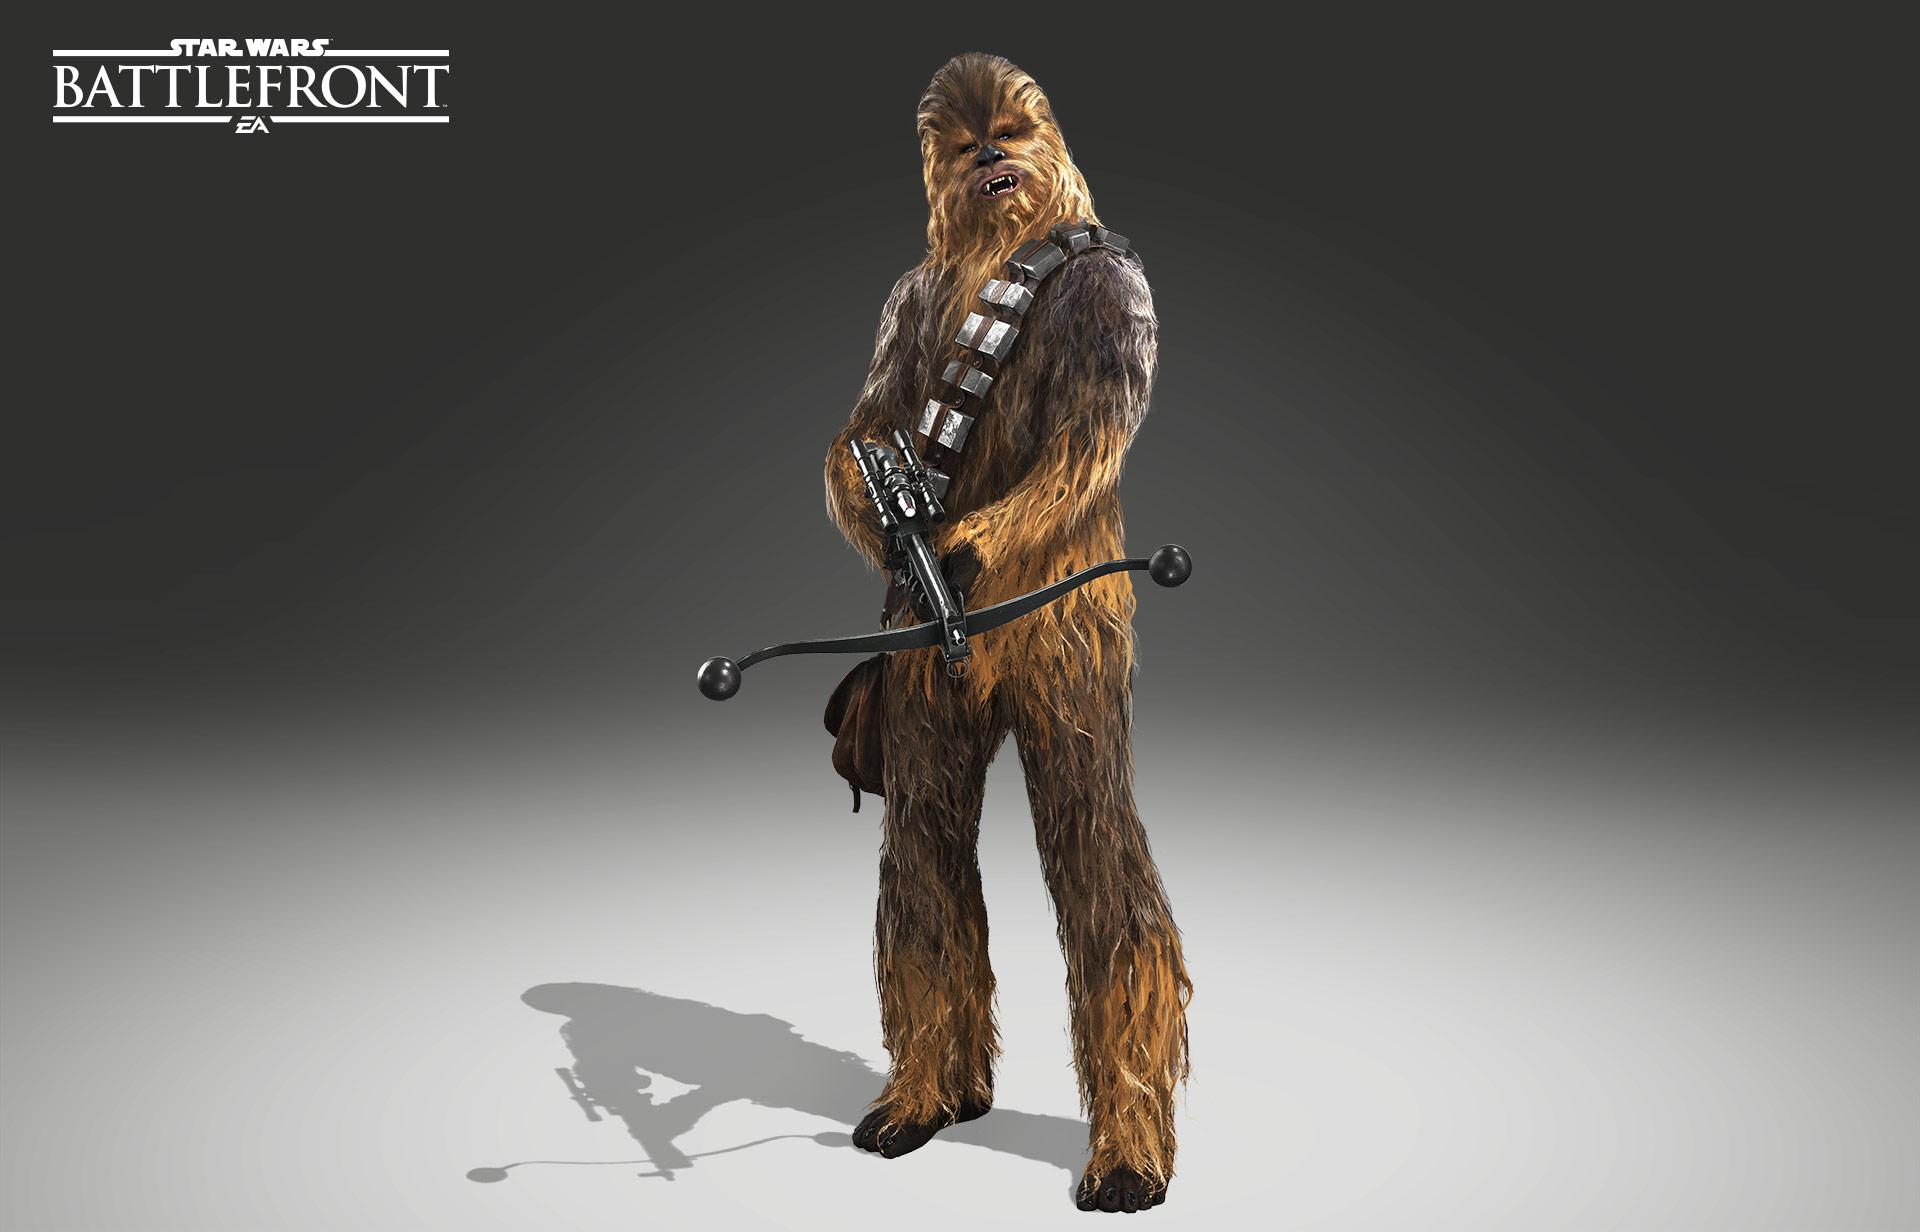 battlefront-chewbacca